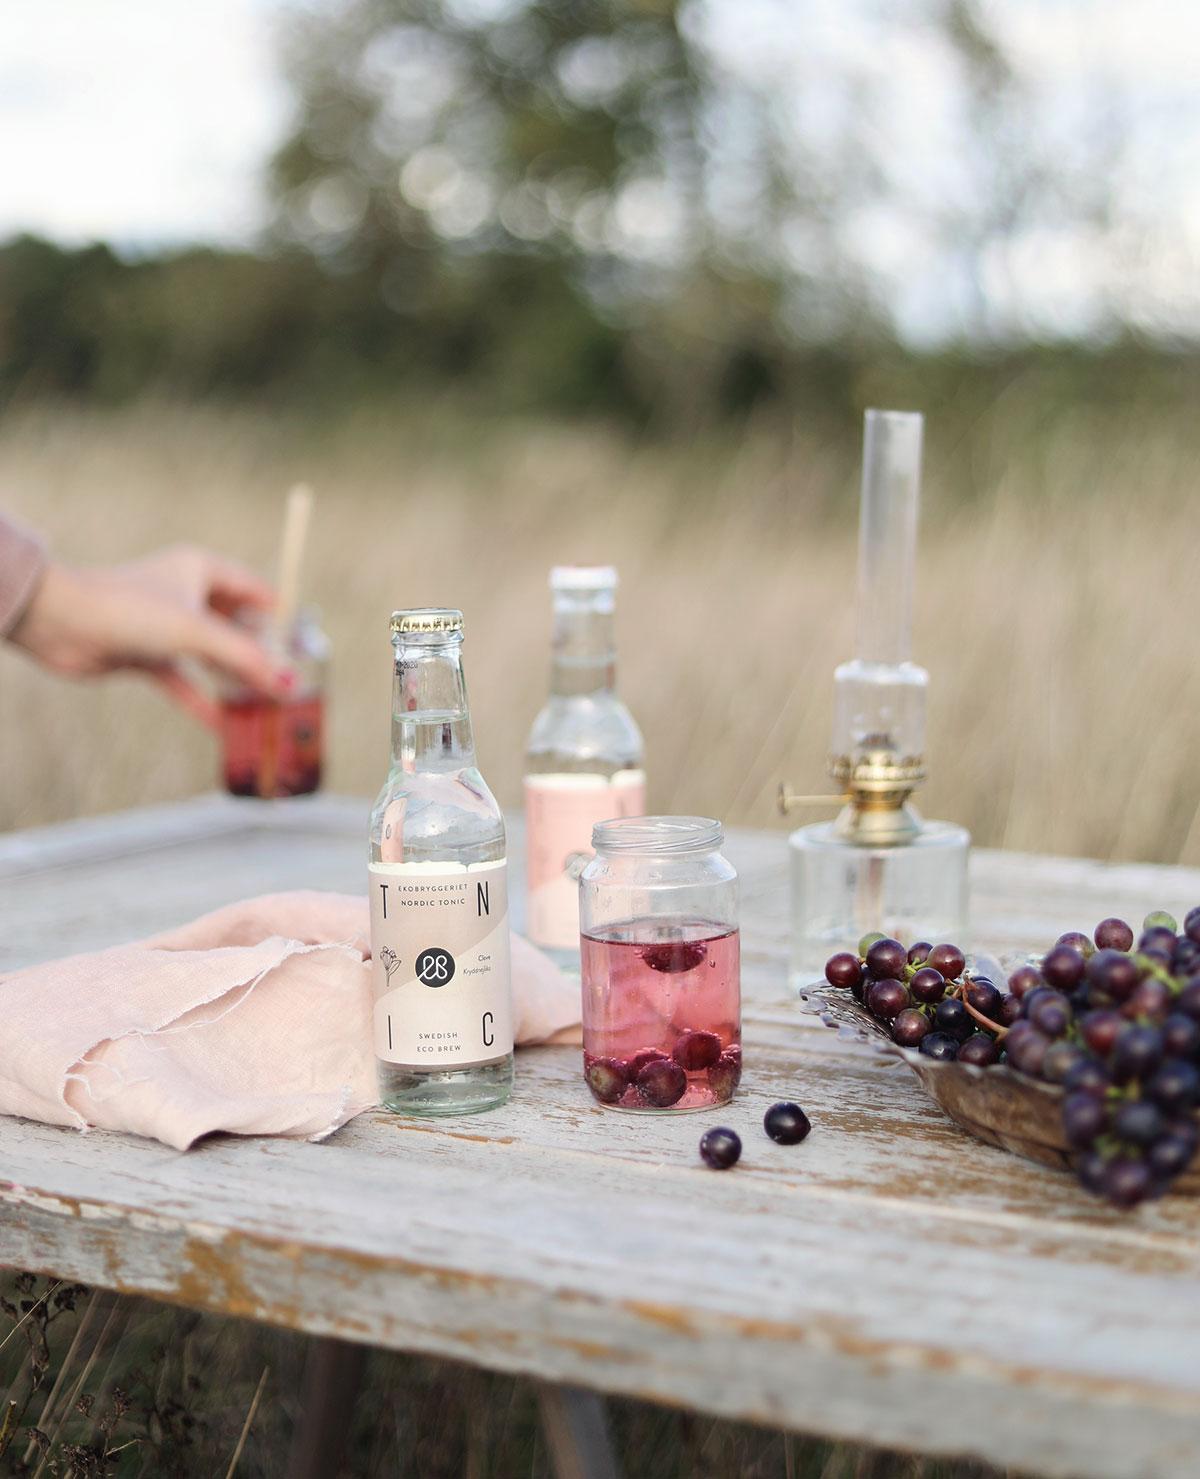 ekobryggeriet drinkar drink vindruvor Gotland soda september